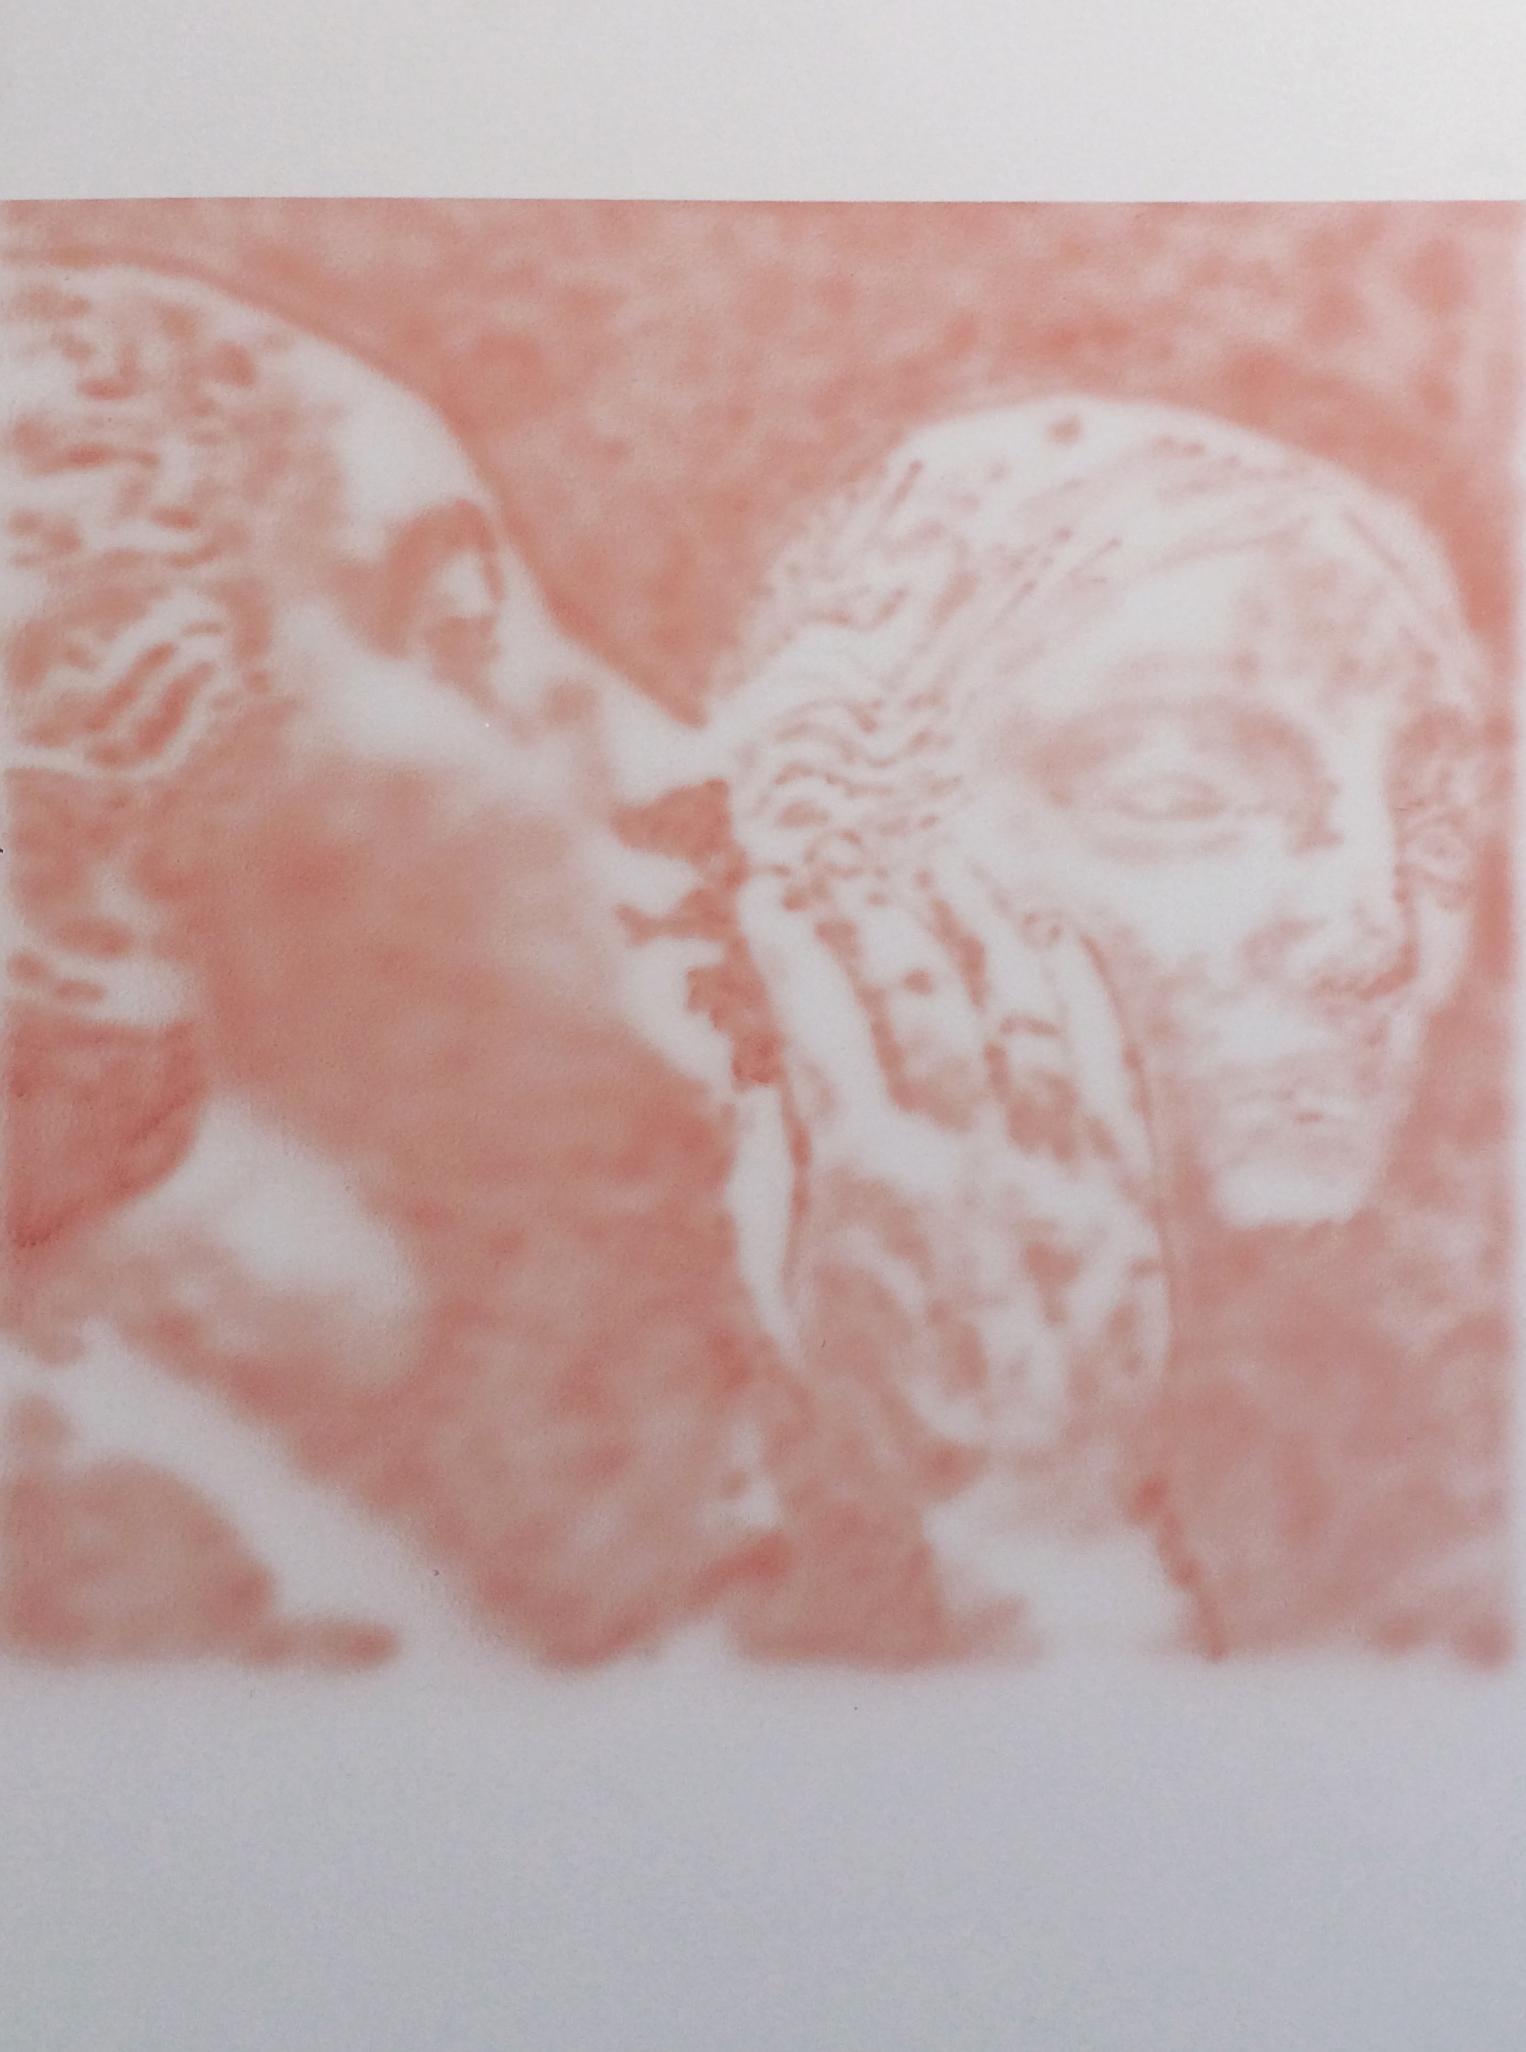 Daniel Long,  Concrete Turned to Stone , 2015, acrylic on panel, 48 x 35″